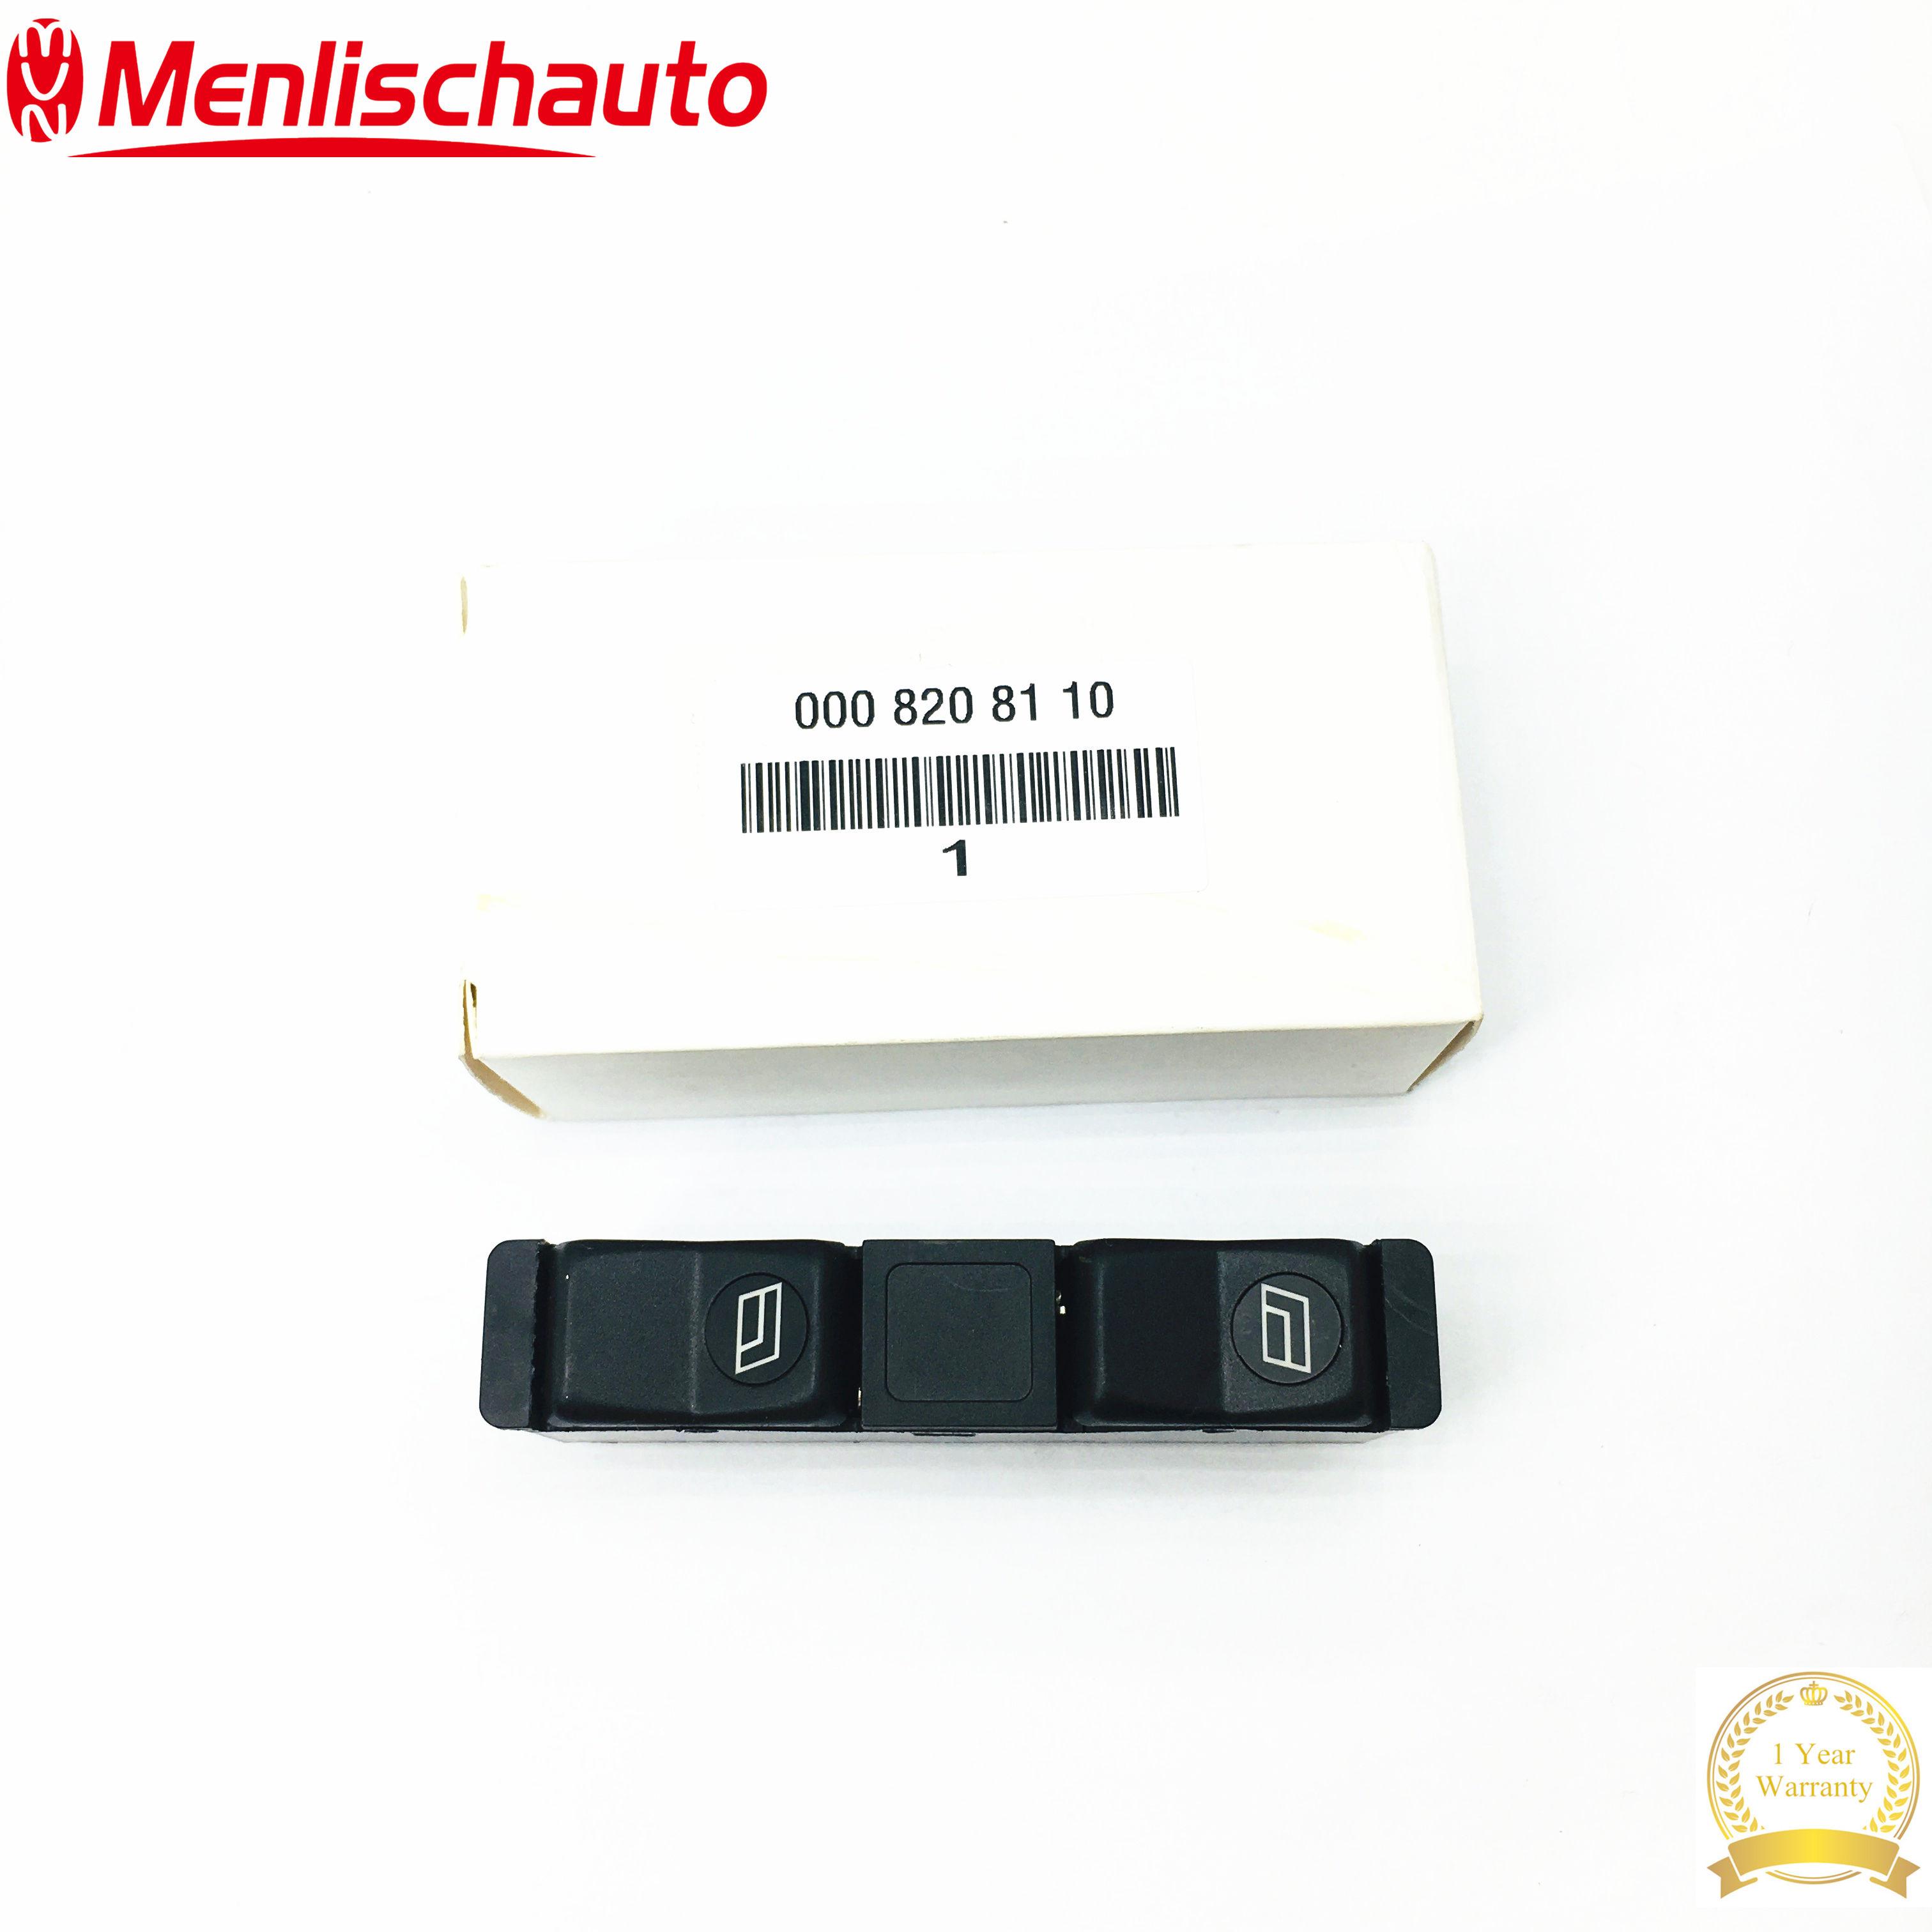 Passenger Rigth Seat Adjustment Buttons Mercedes Benz 81-93